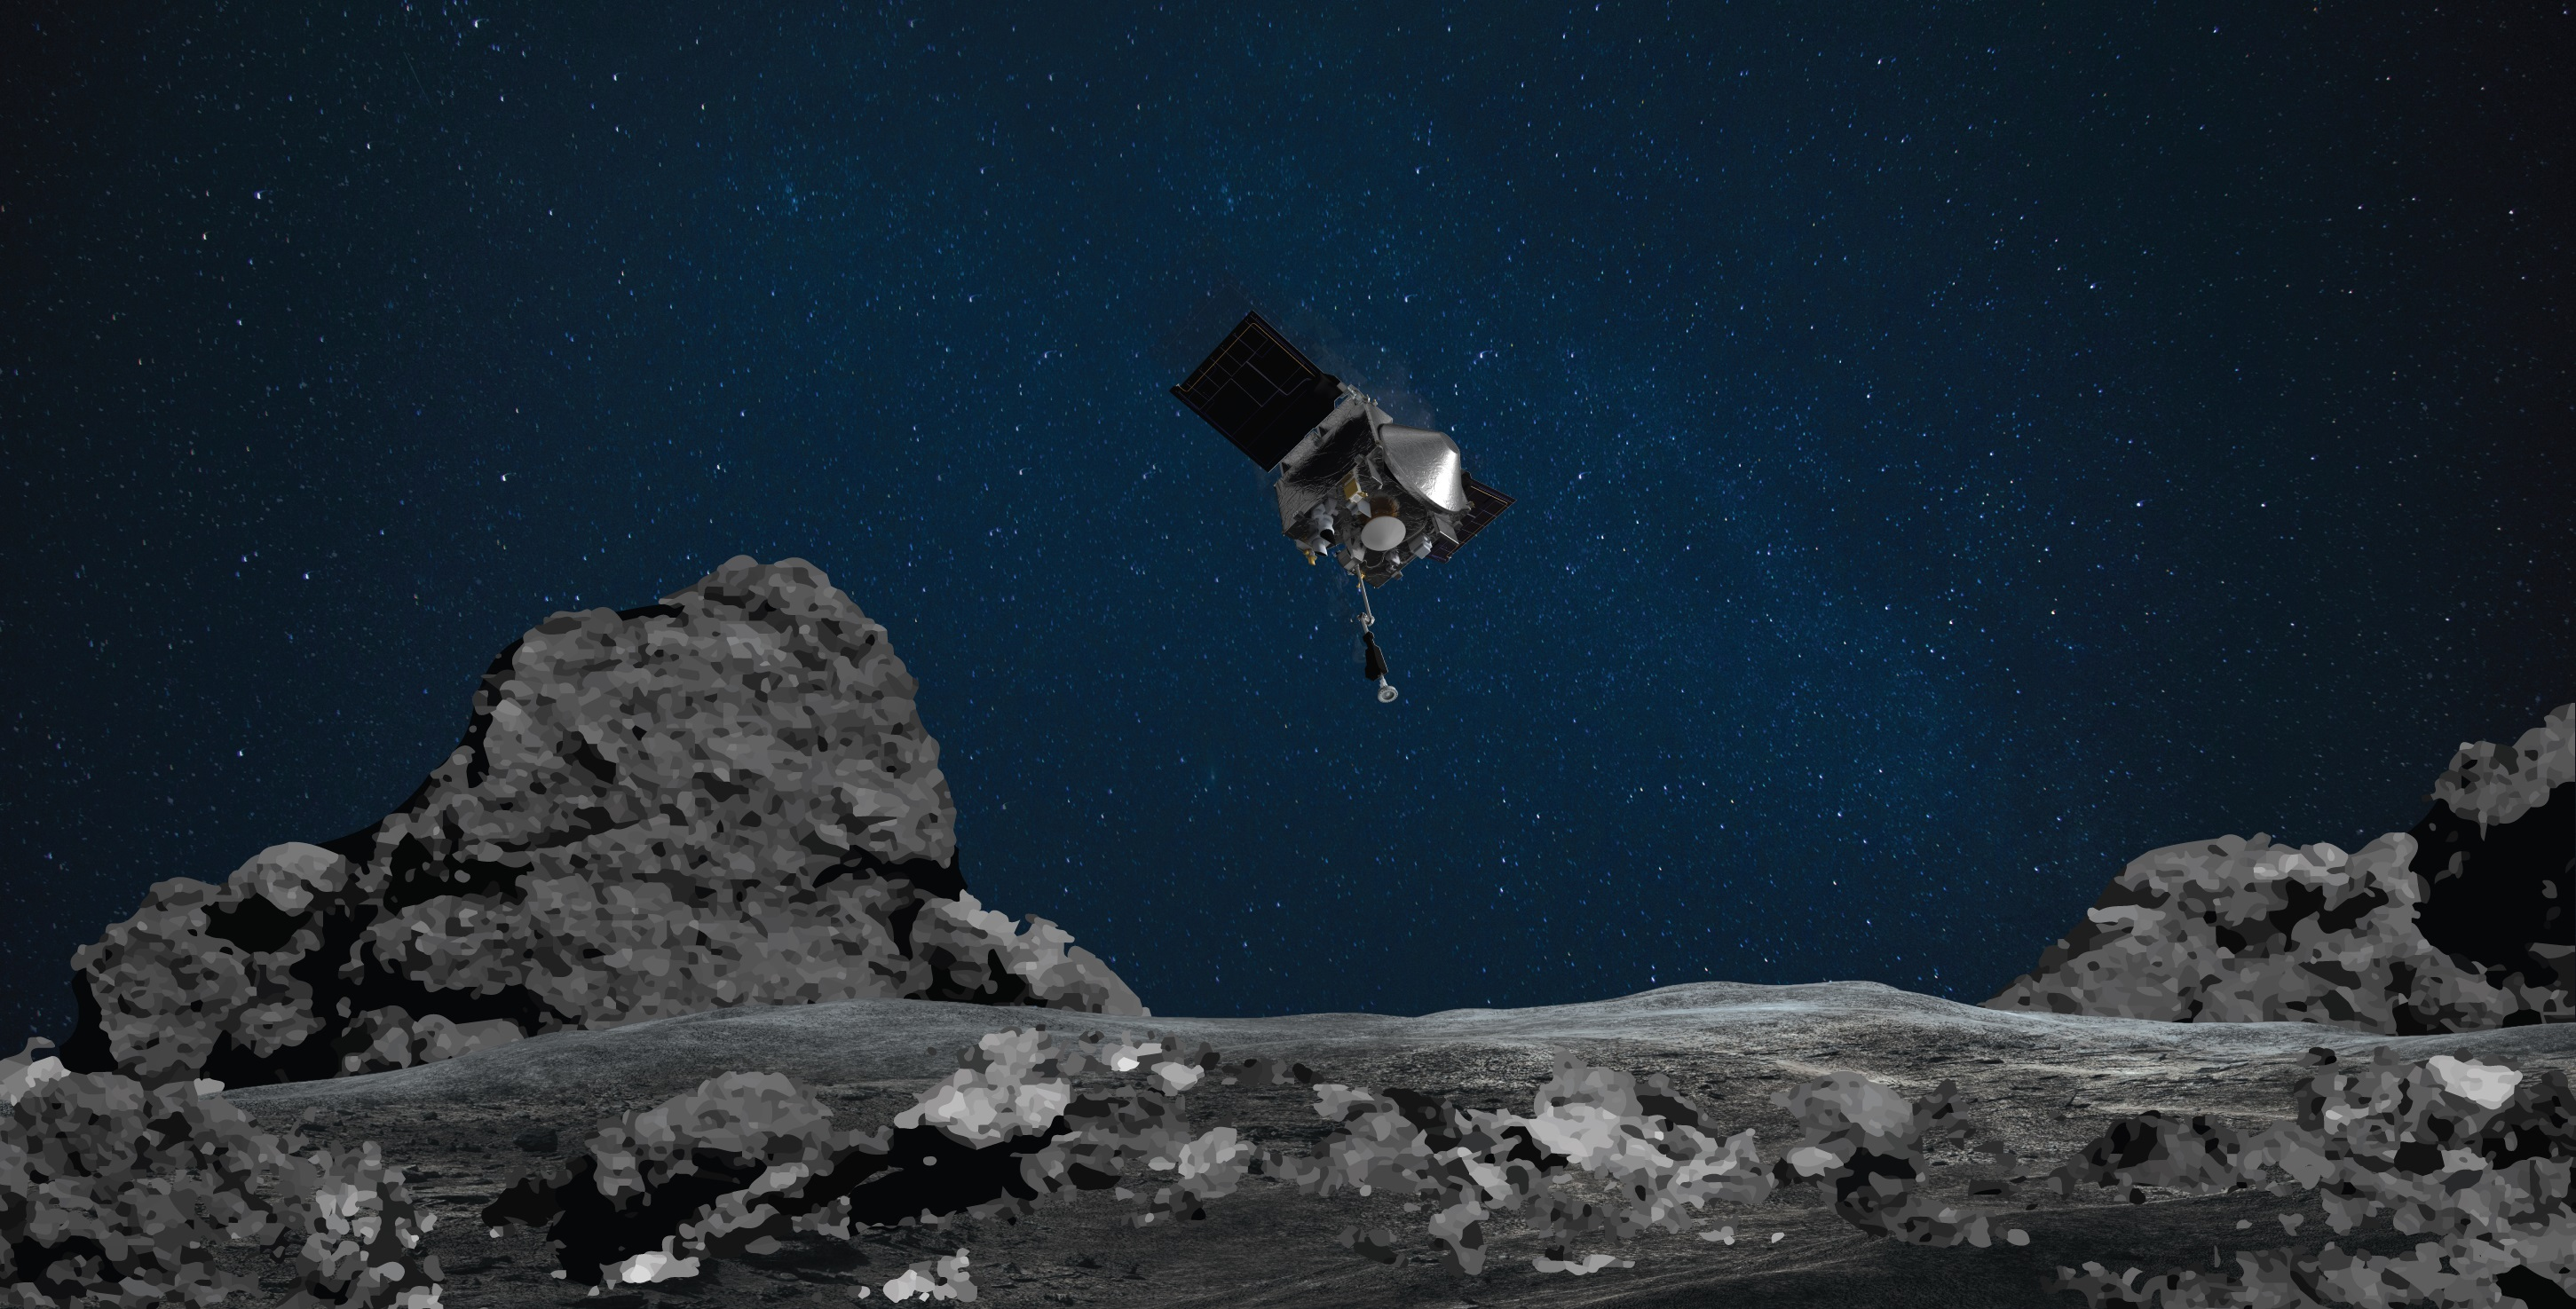 NASA: Osiris-Rex inicia volta à Terra com amostra do asteroide Bennu